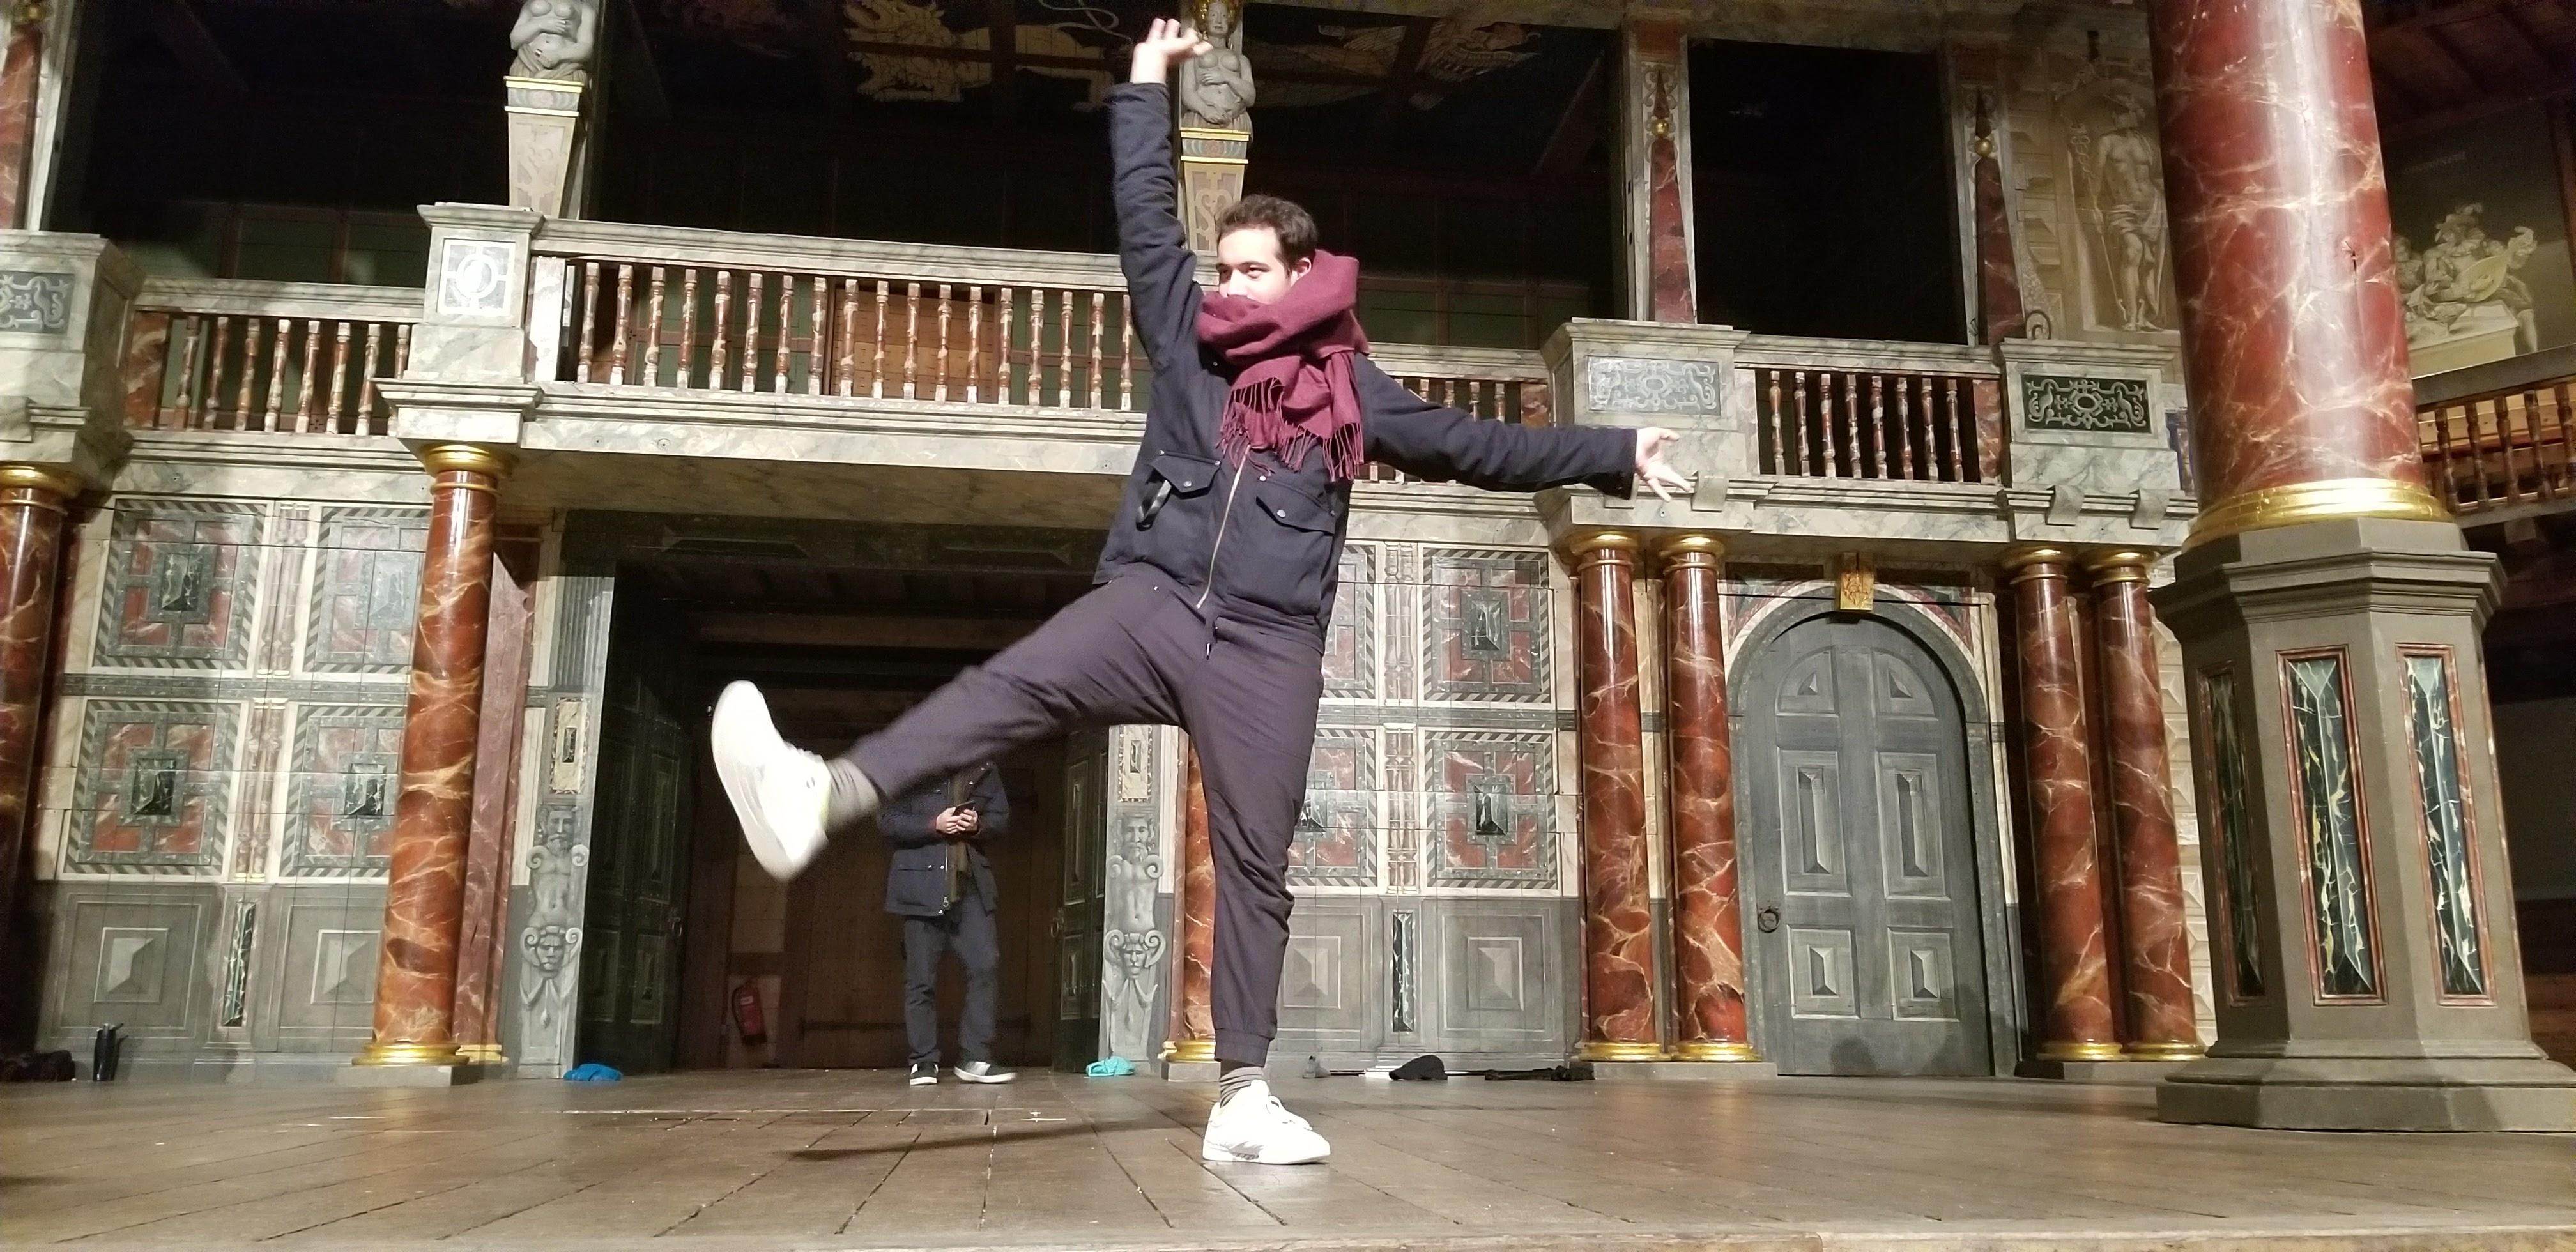 CAPAStudyAbroad_London_Fall2017_From Thaddeus Kaszuba - Goofing on the Globe Stage.jpg